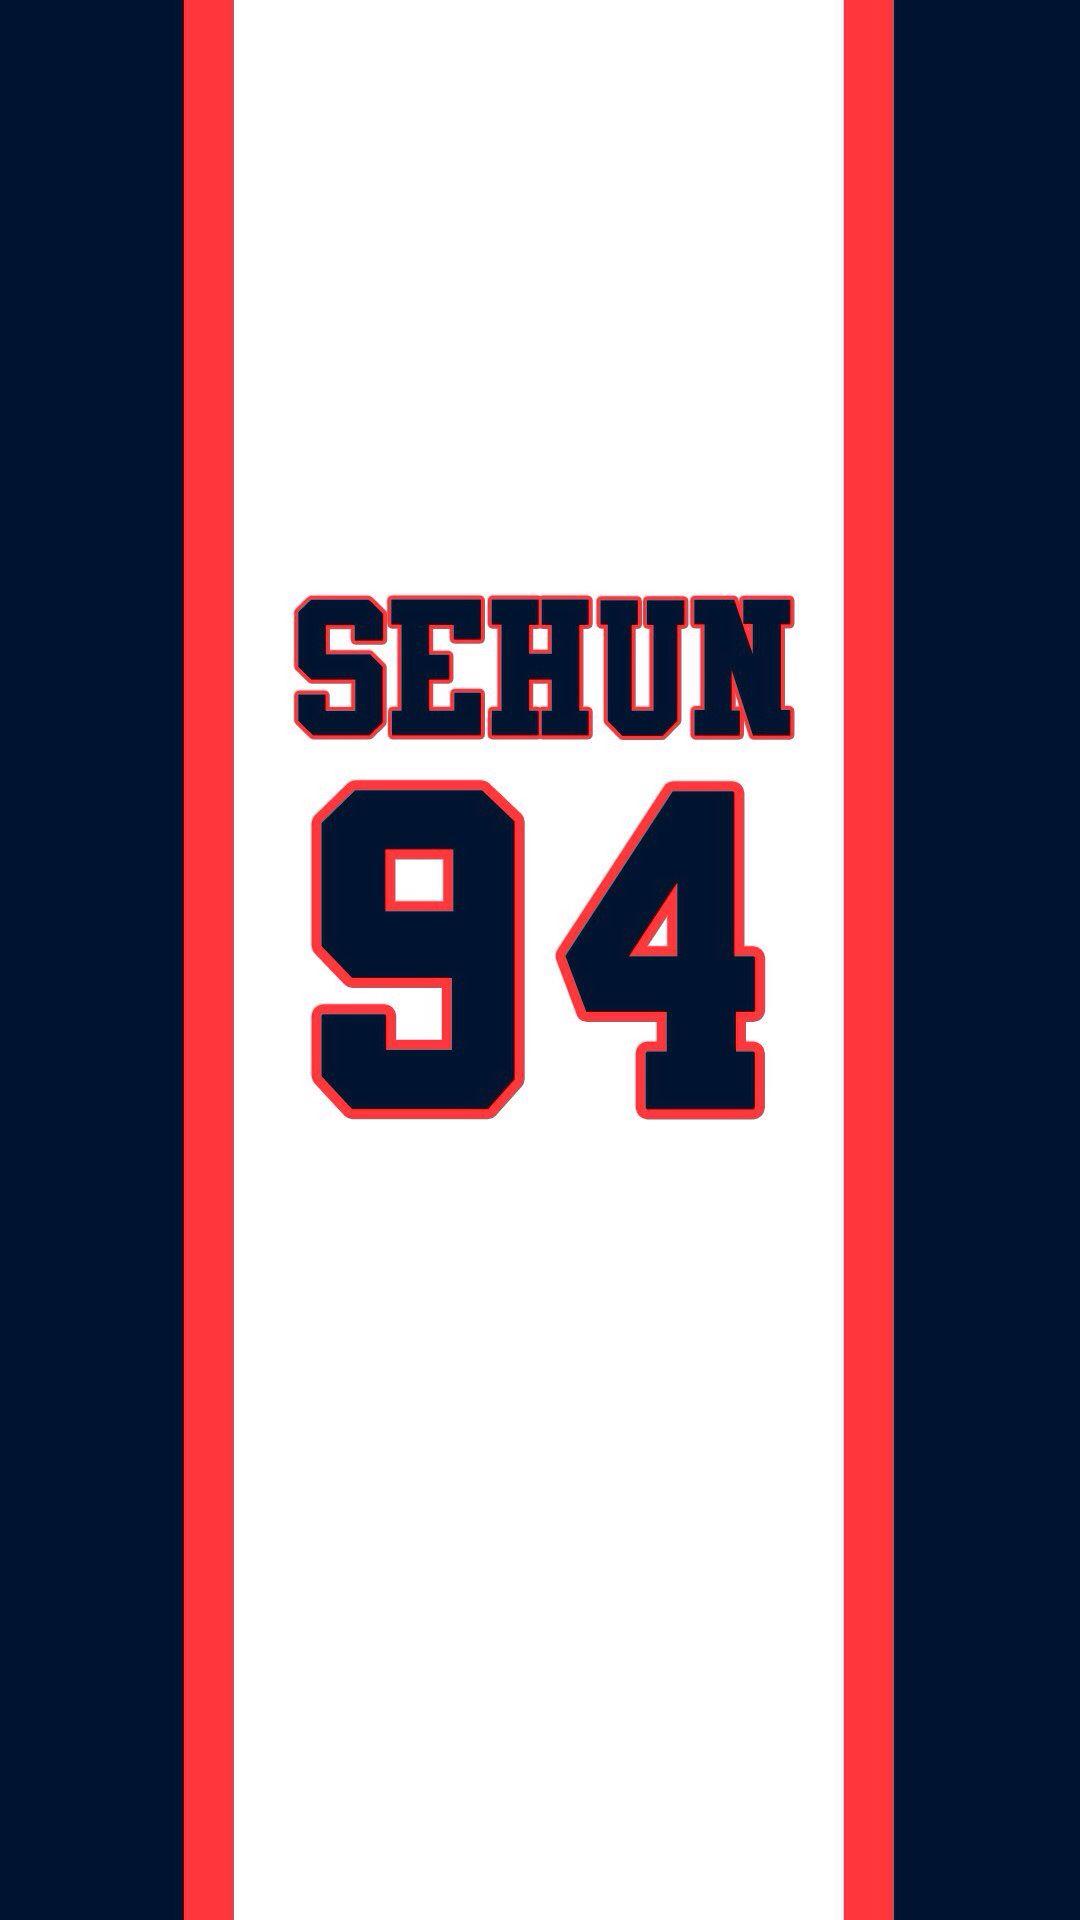 Exo sehun number potenial background exo exo - Number wallpaper ...